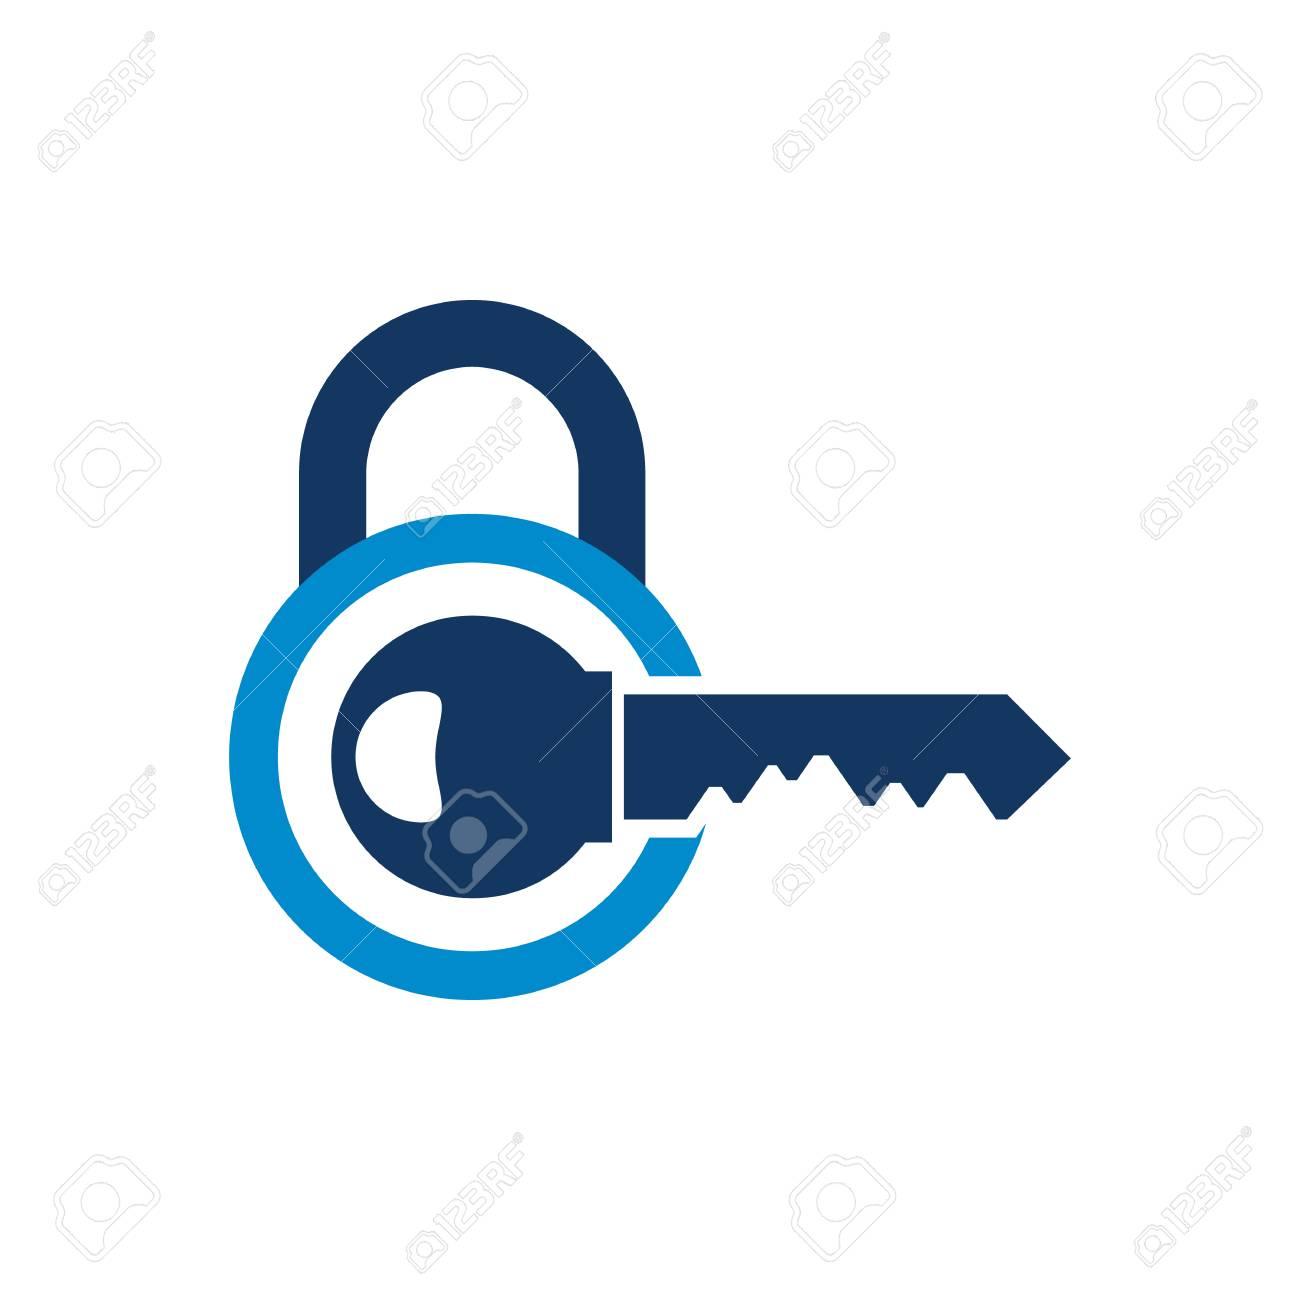 Lock and key logo Designcrowd Key Lock Logo Icon Design Stock Vector 101699222 Logo Design Designcrowd Key Lock Logo Icon Design Royalty Free Cliparts Vectors And Stock